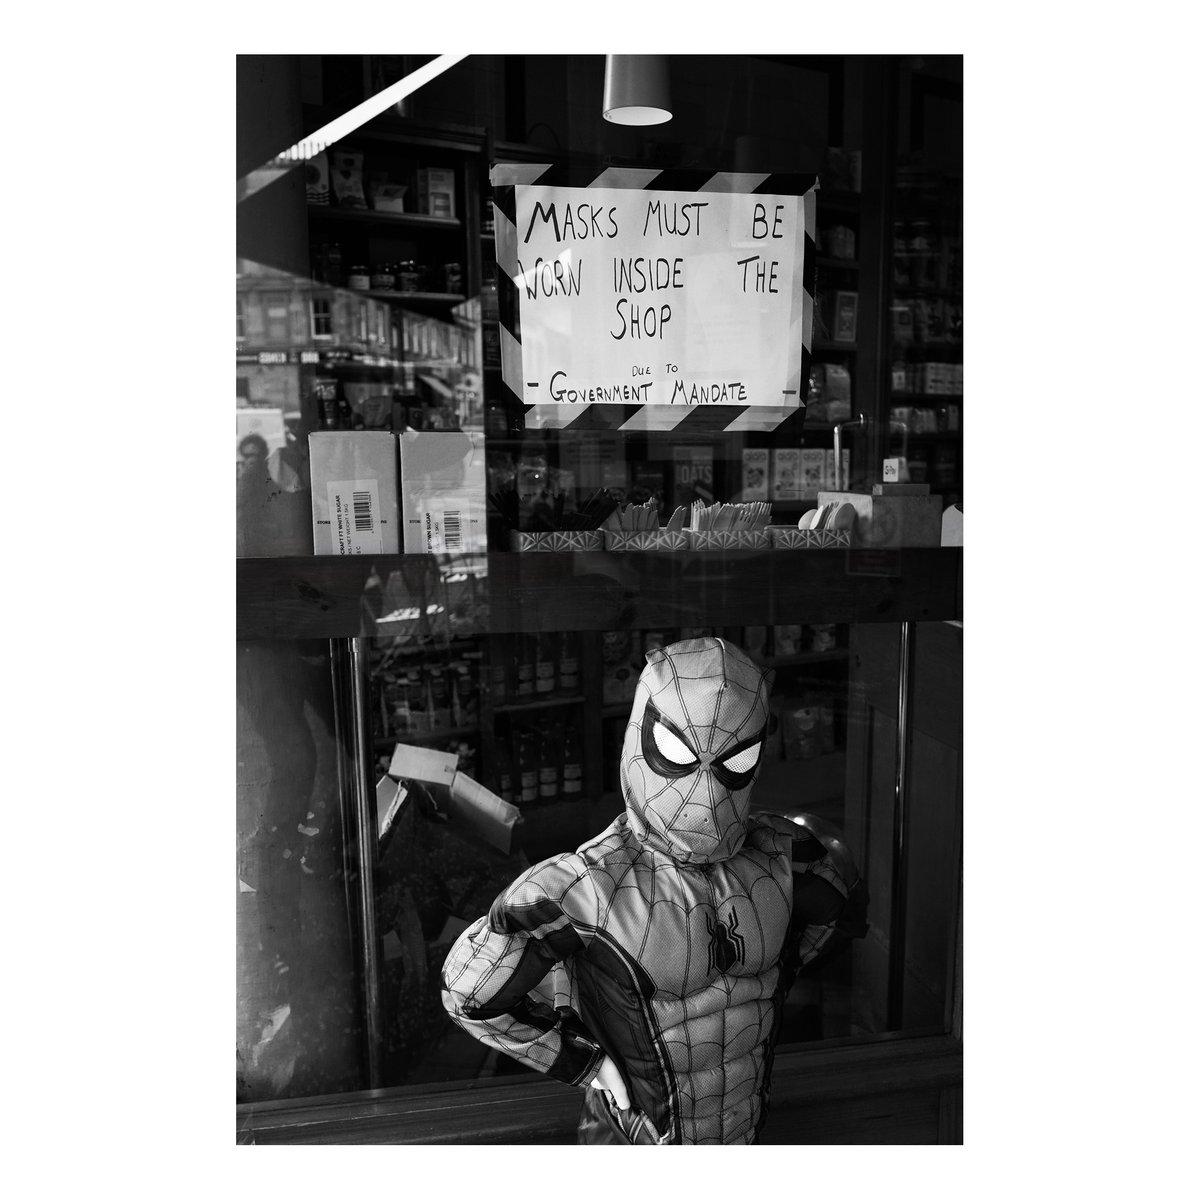 Be like Spiderman.#SpiderMan #Scotland #facemasks #SafetyFirst #COVID19 #WearAMaskpic.twitter.com/BfalYZiej7